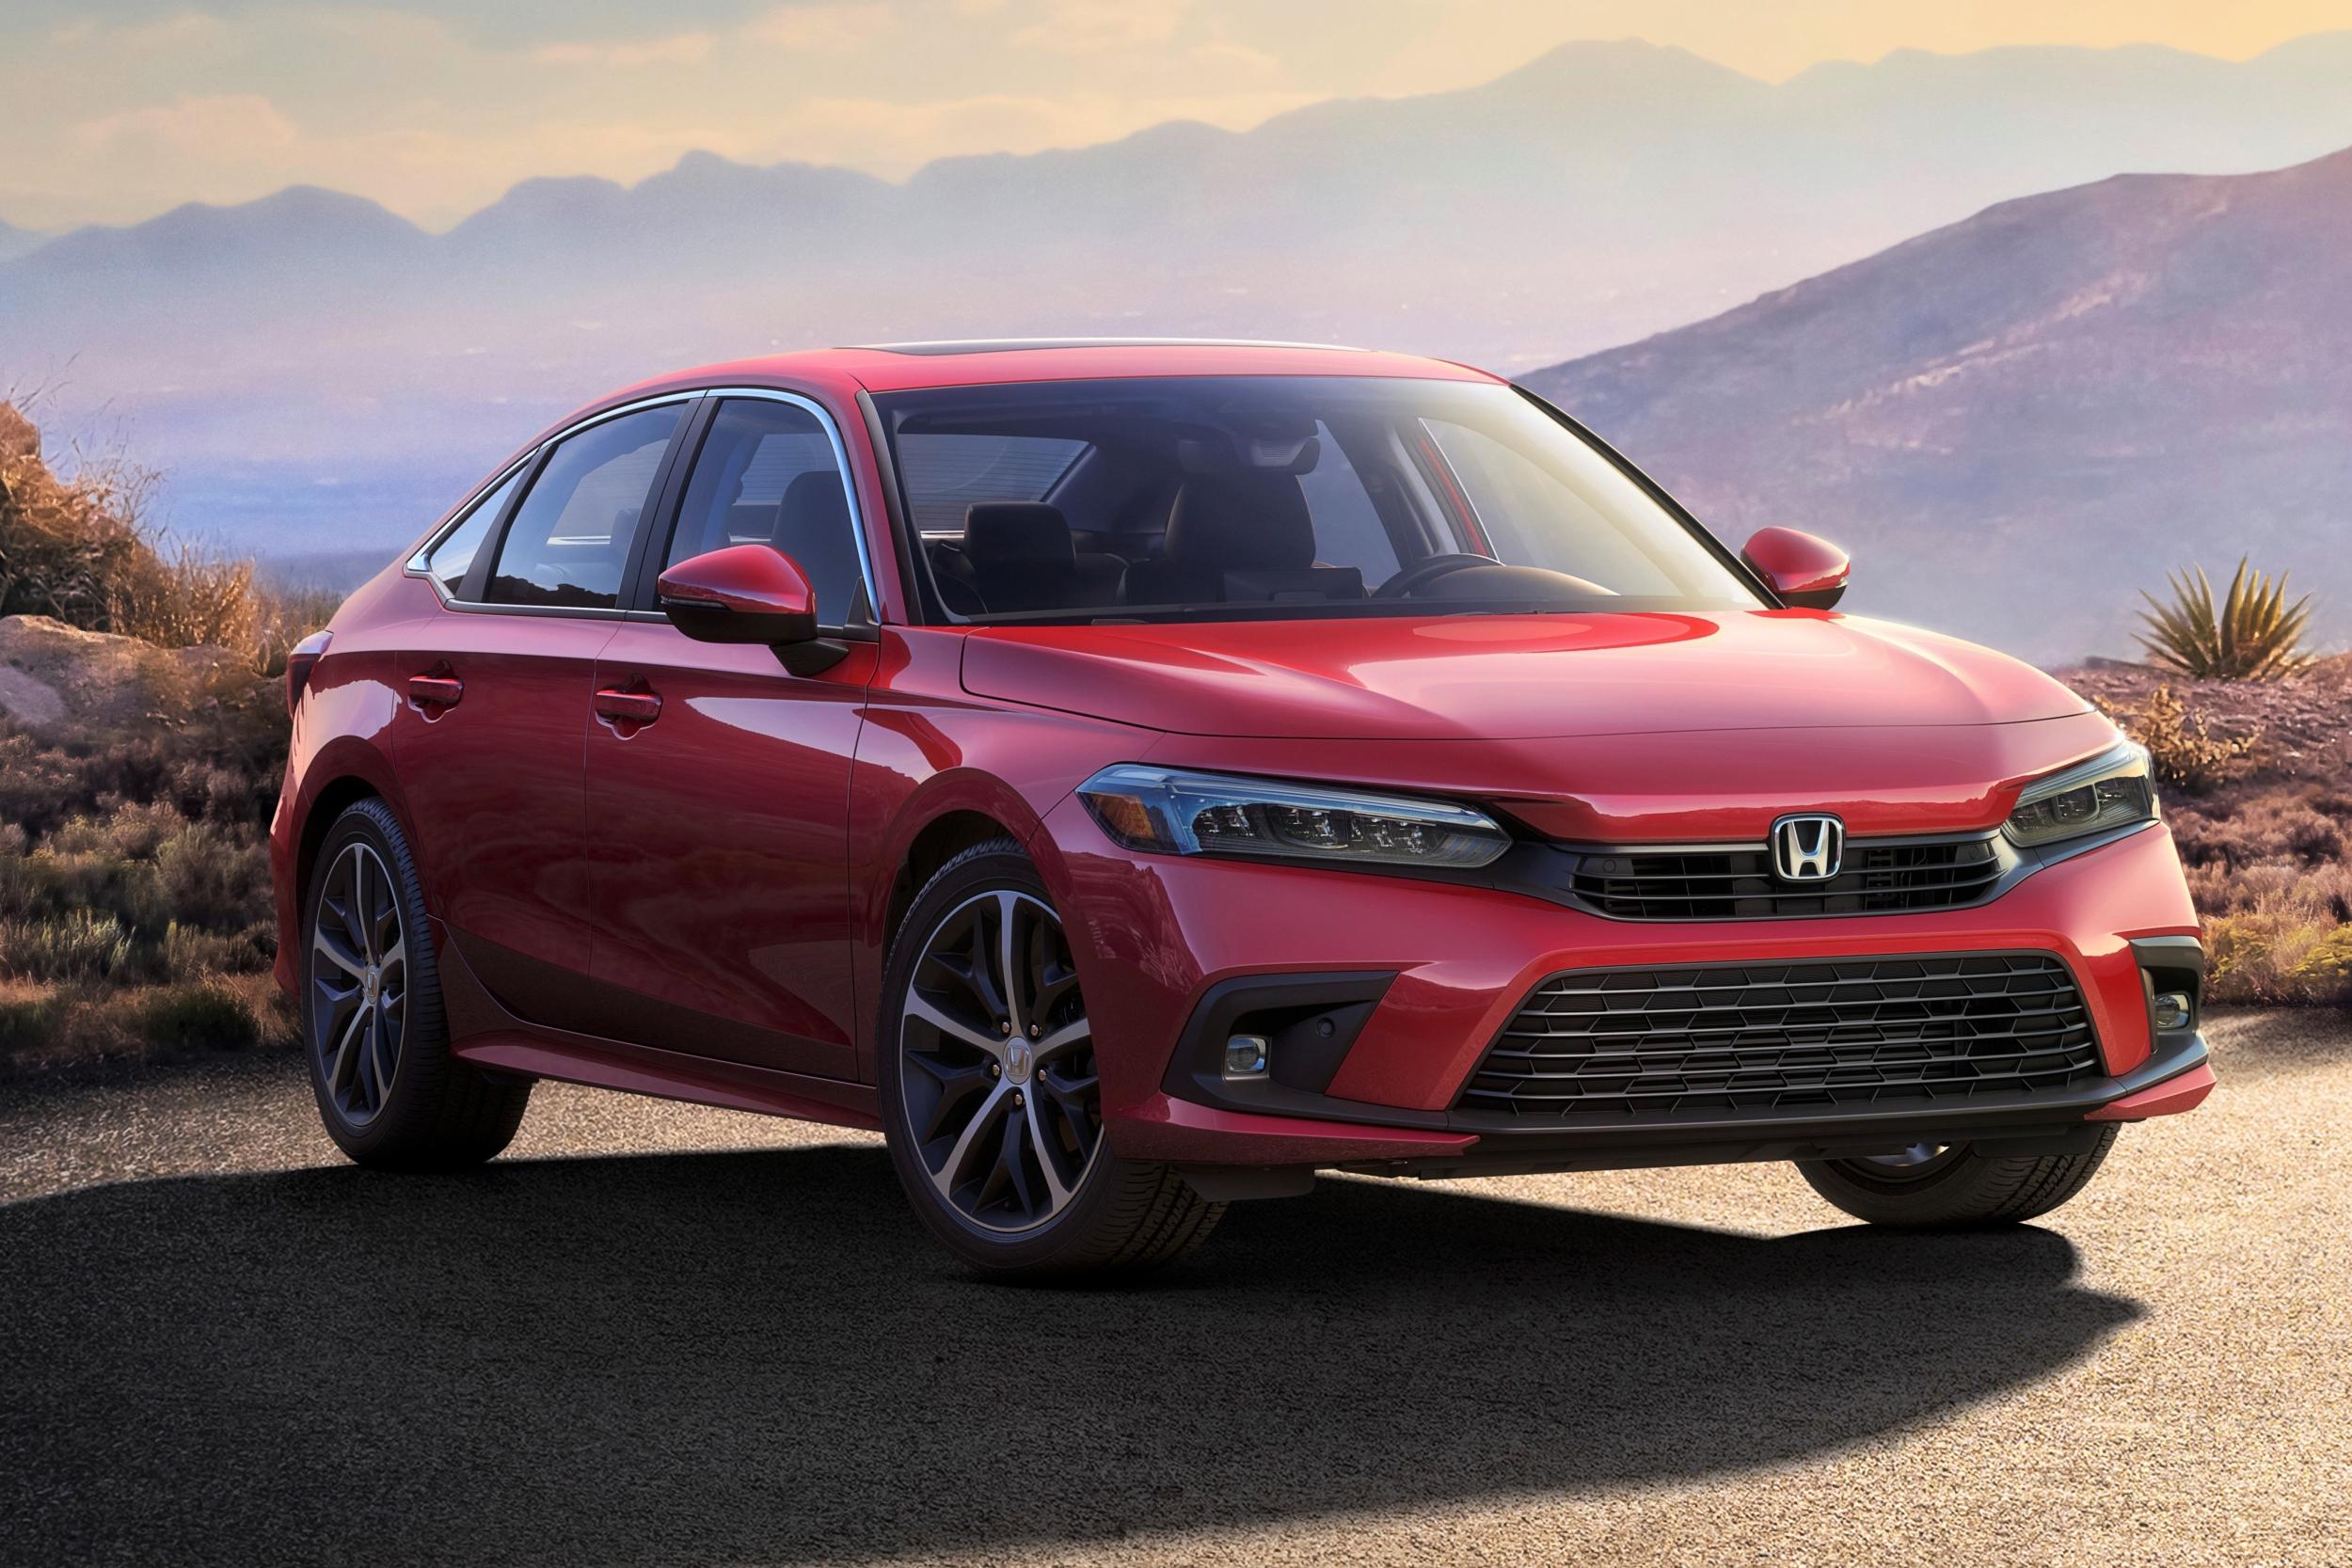 new Honda Civic 2022 AutoinfoOnline (4)